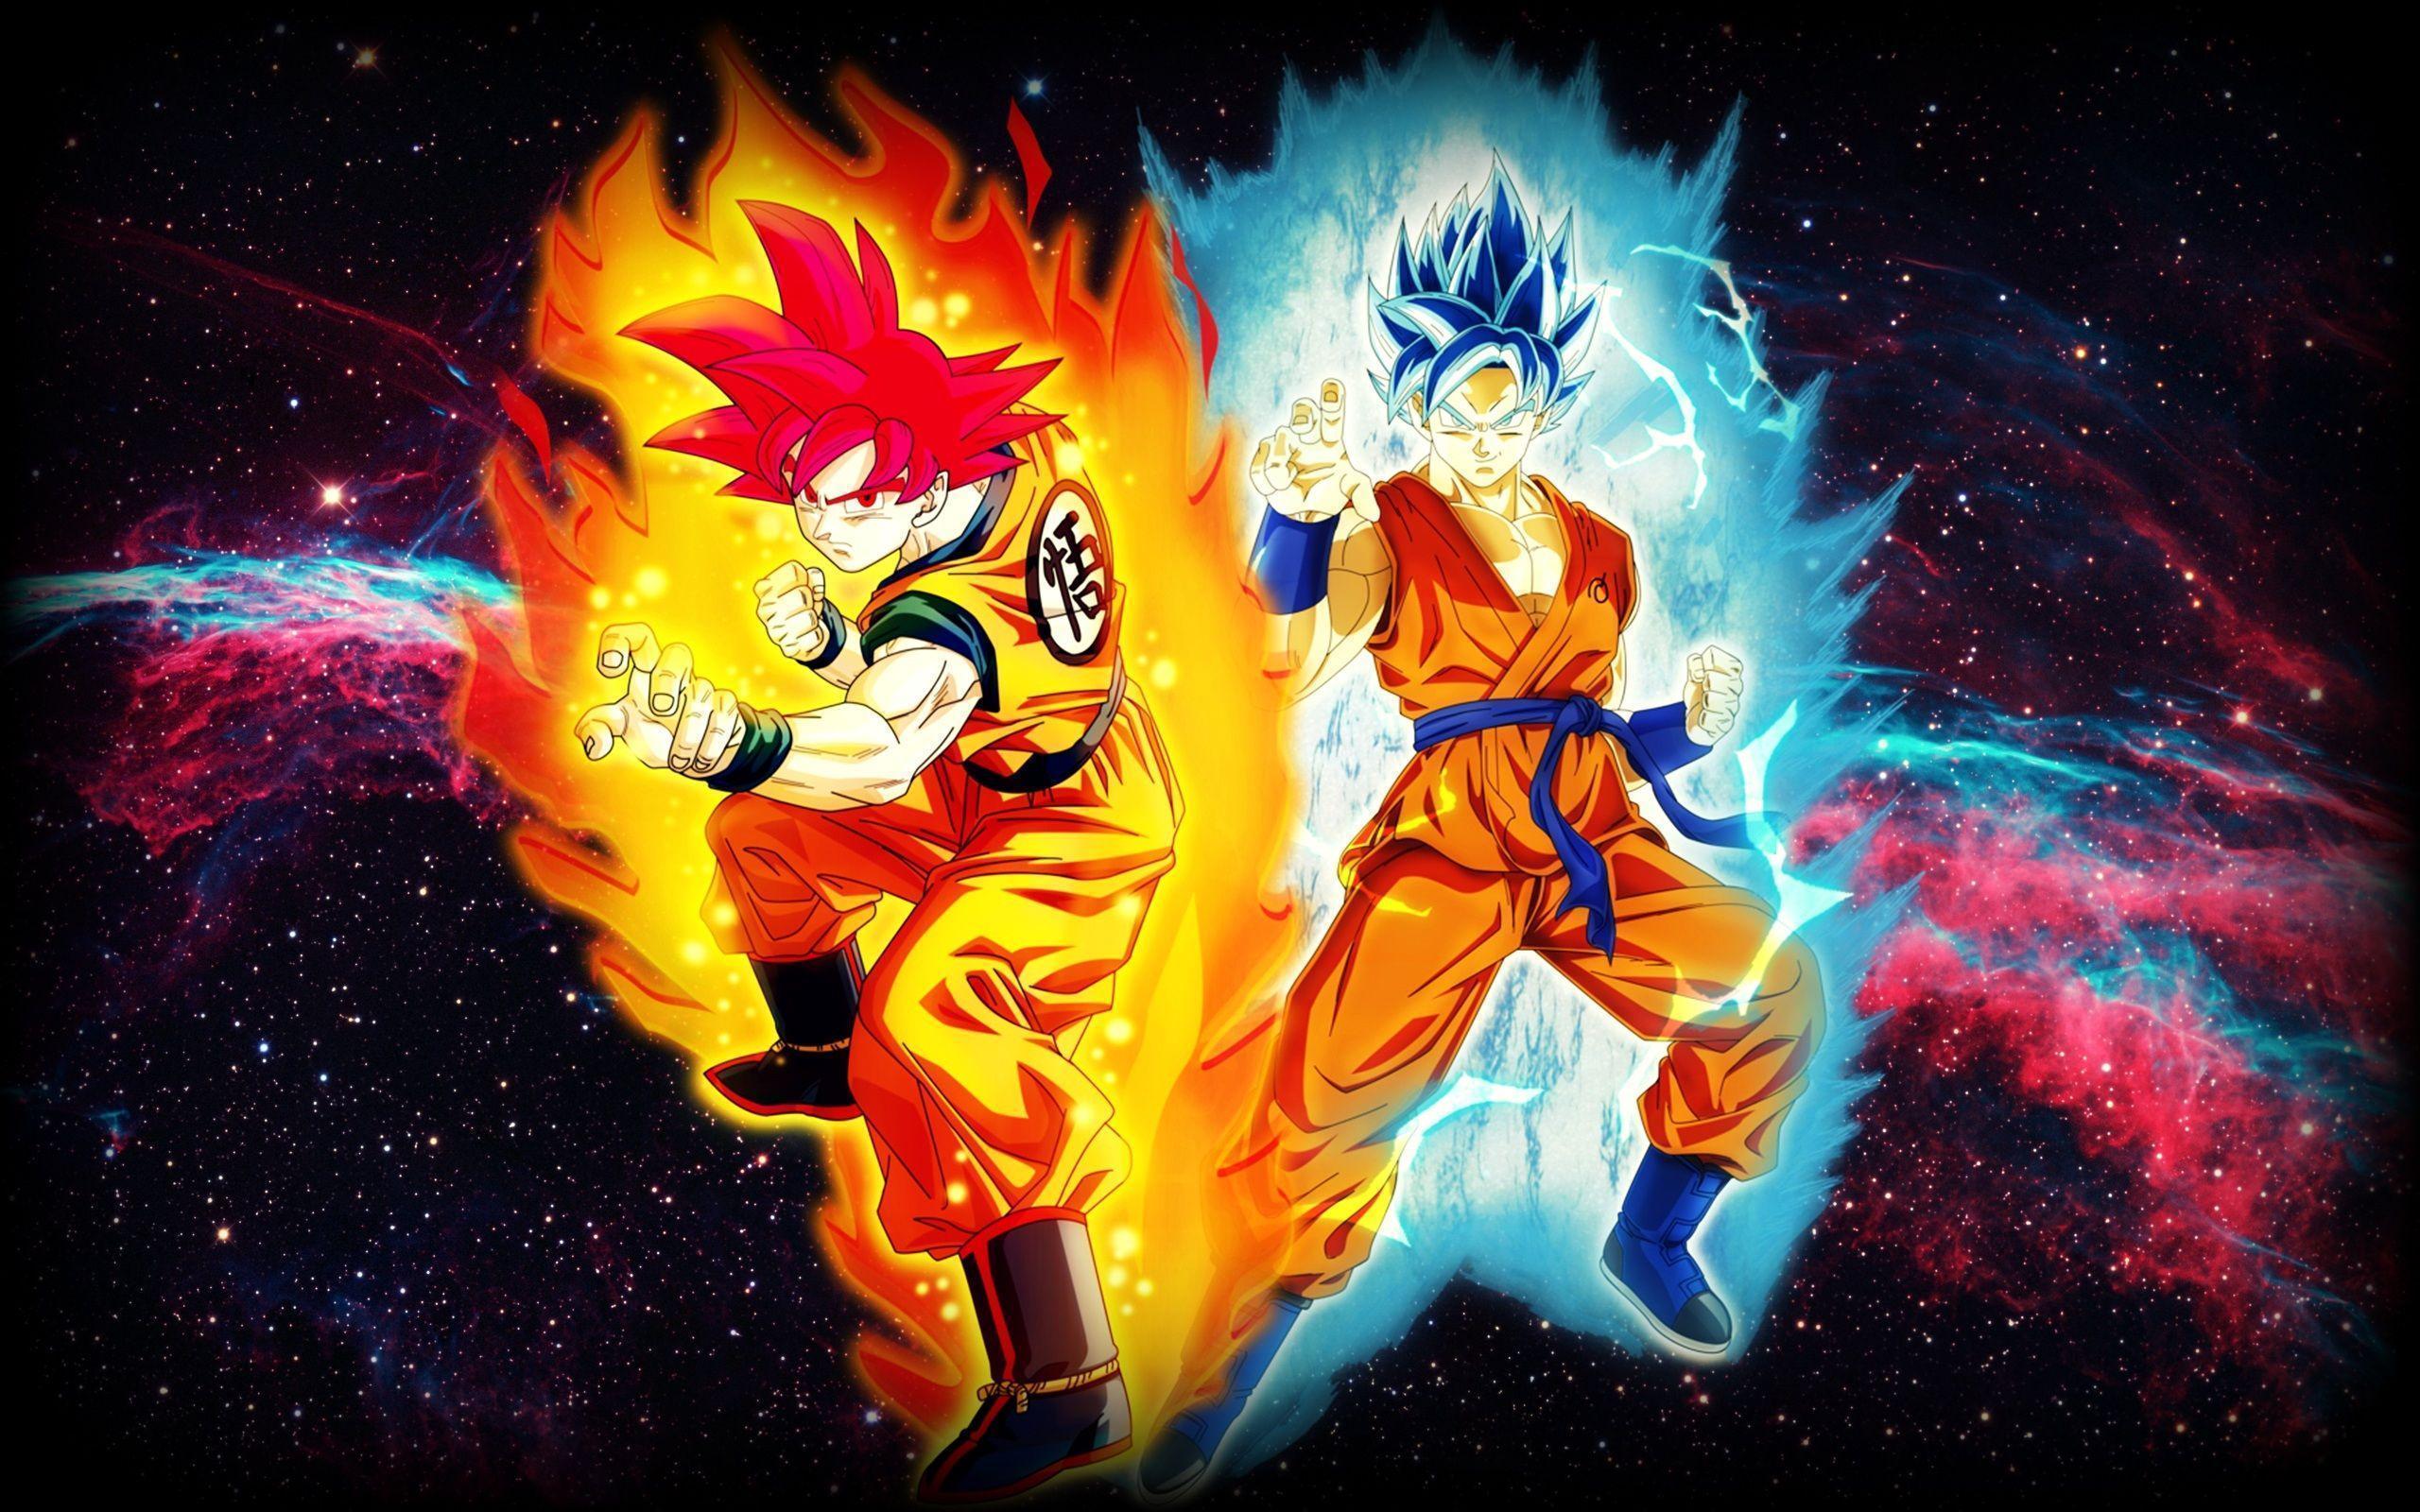 Goku And Vegeta Full Hd Fondo De Pantalla And Fondo De: Goku SSGSS Wallpapers